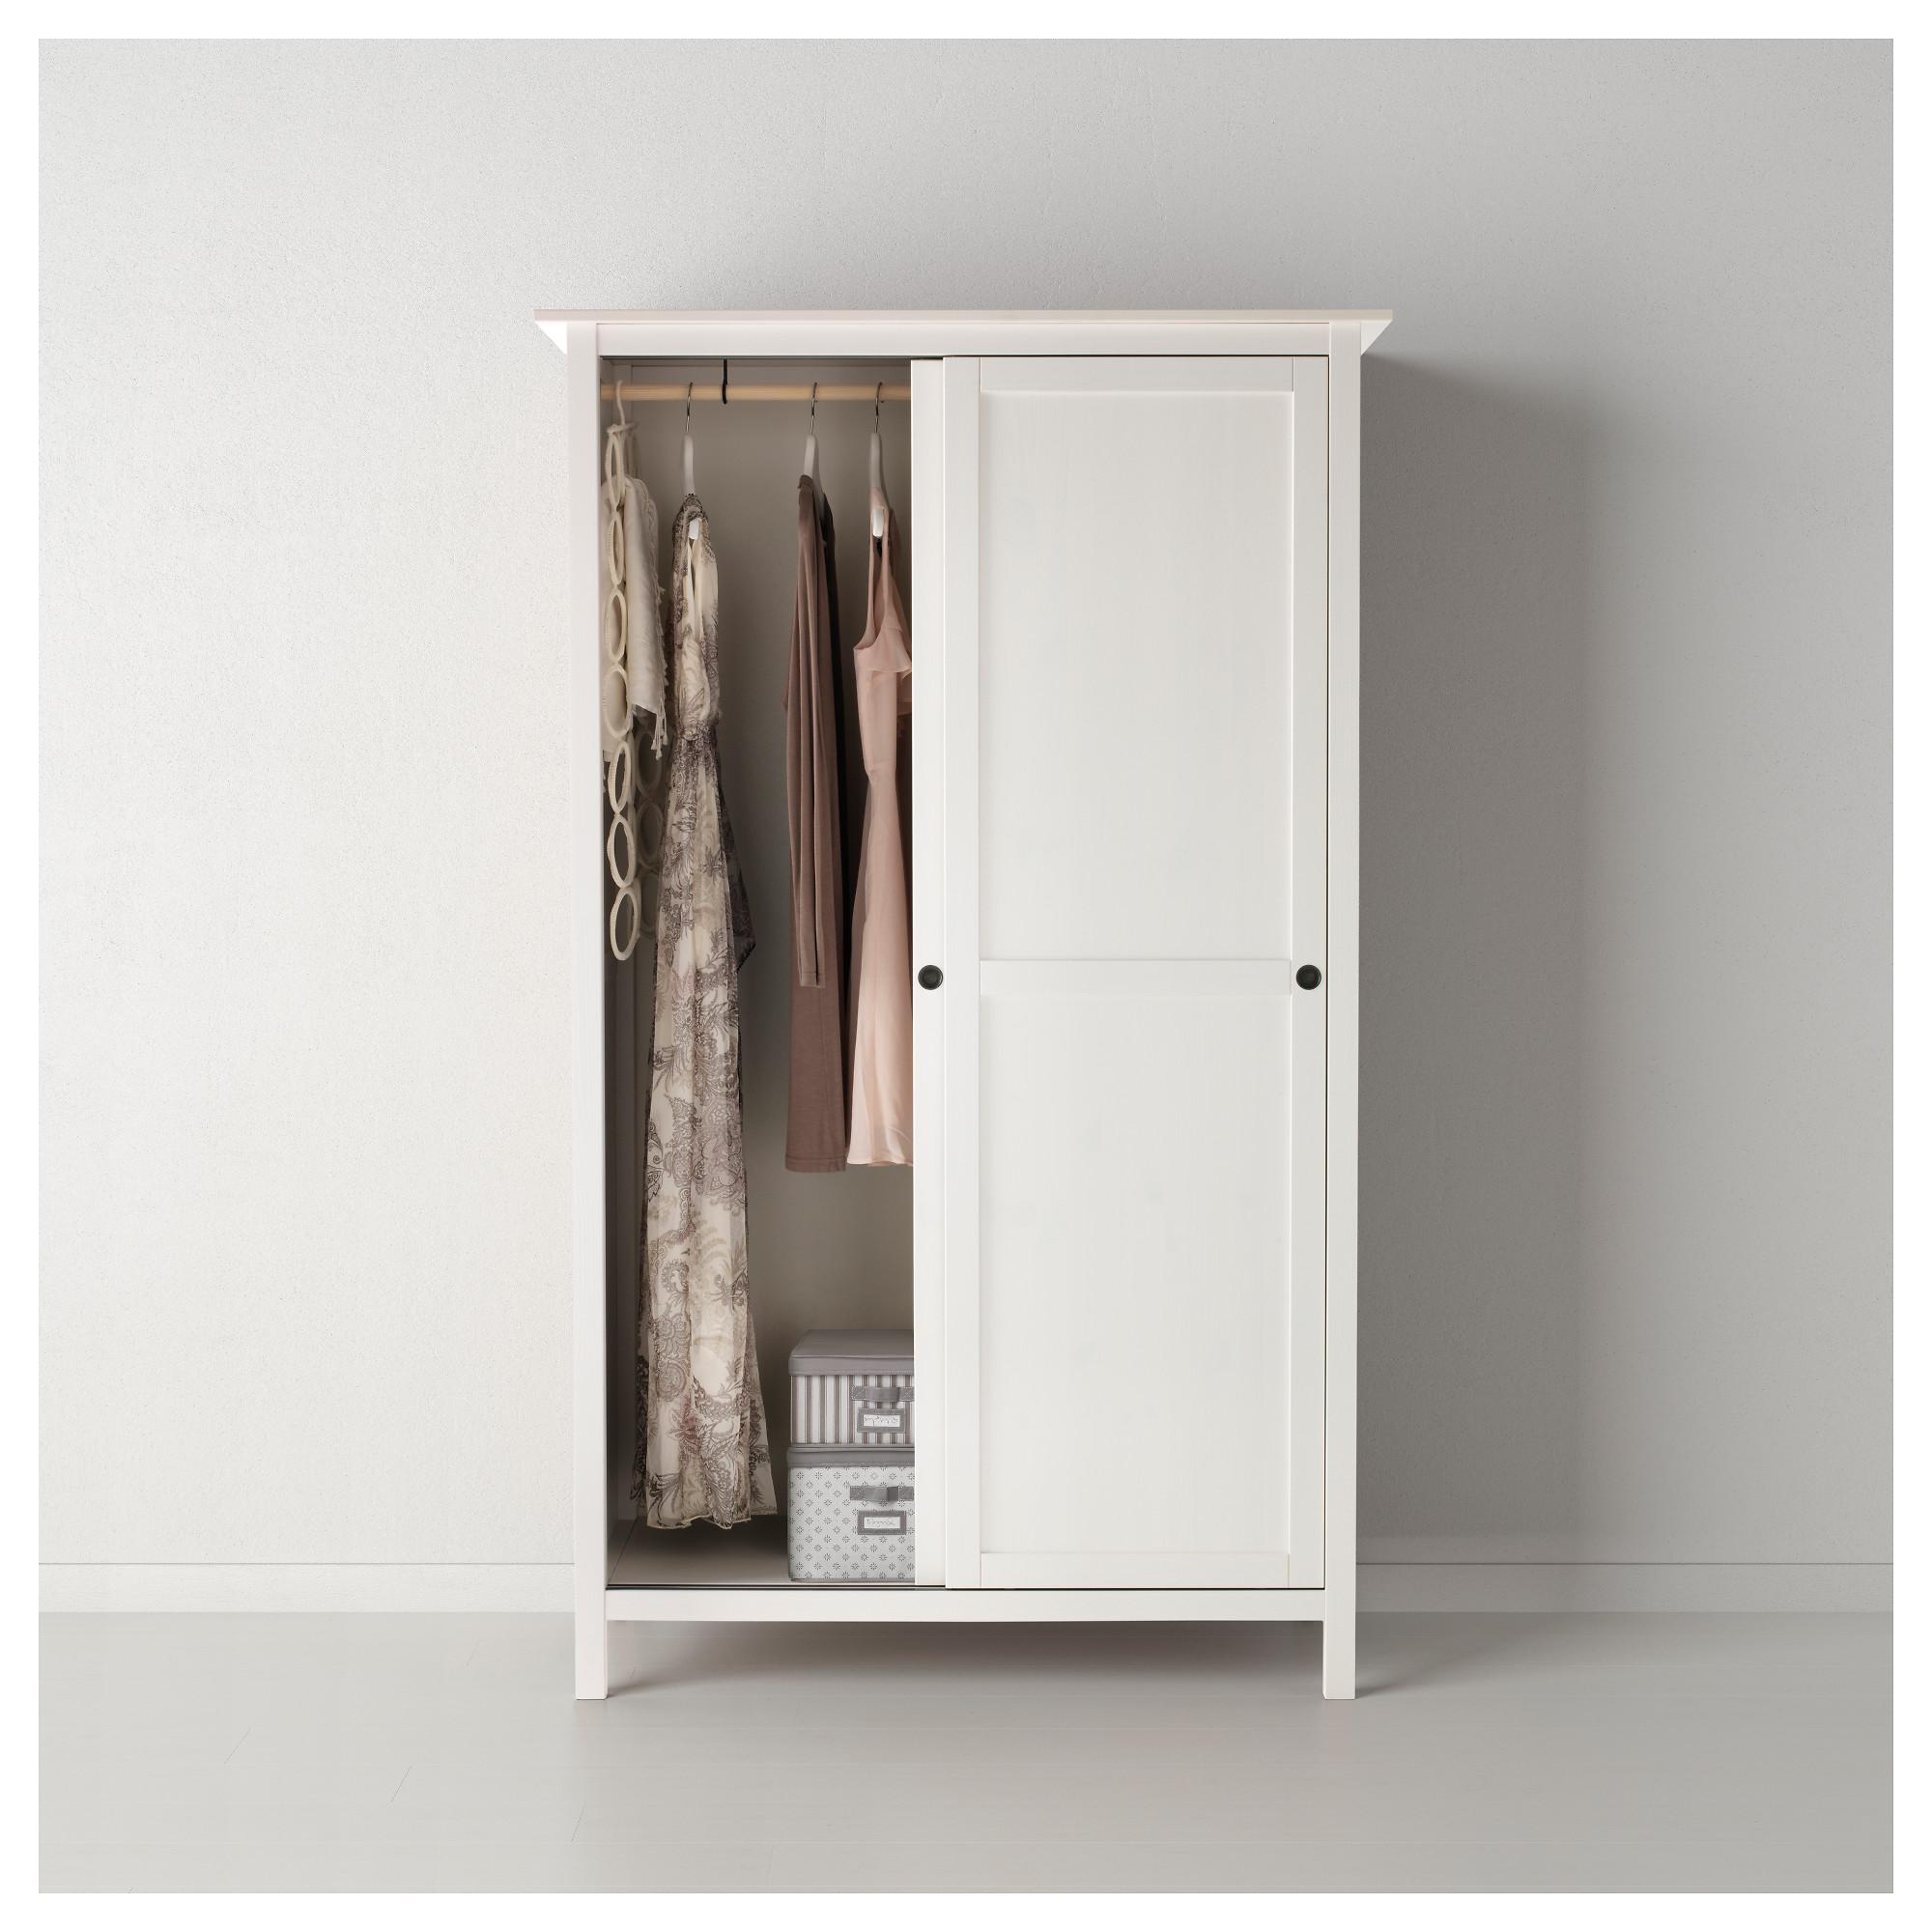 Ante Guardaroba Ikea.Ikea Latvia Shop For Furniture Lighting Home Accessories